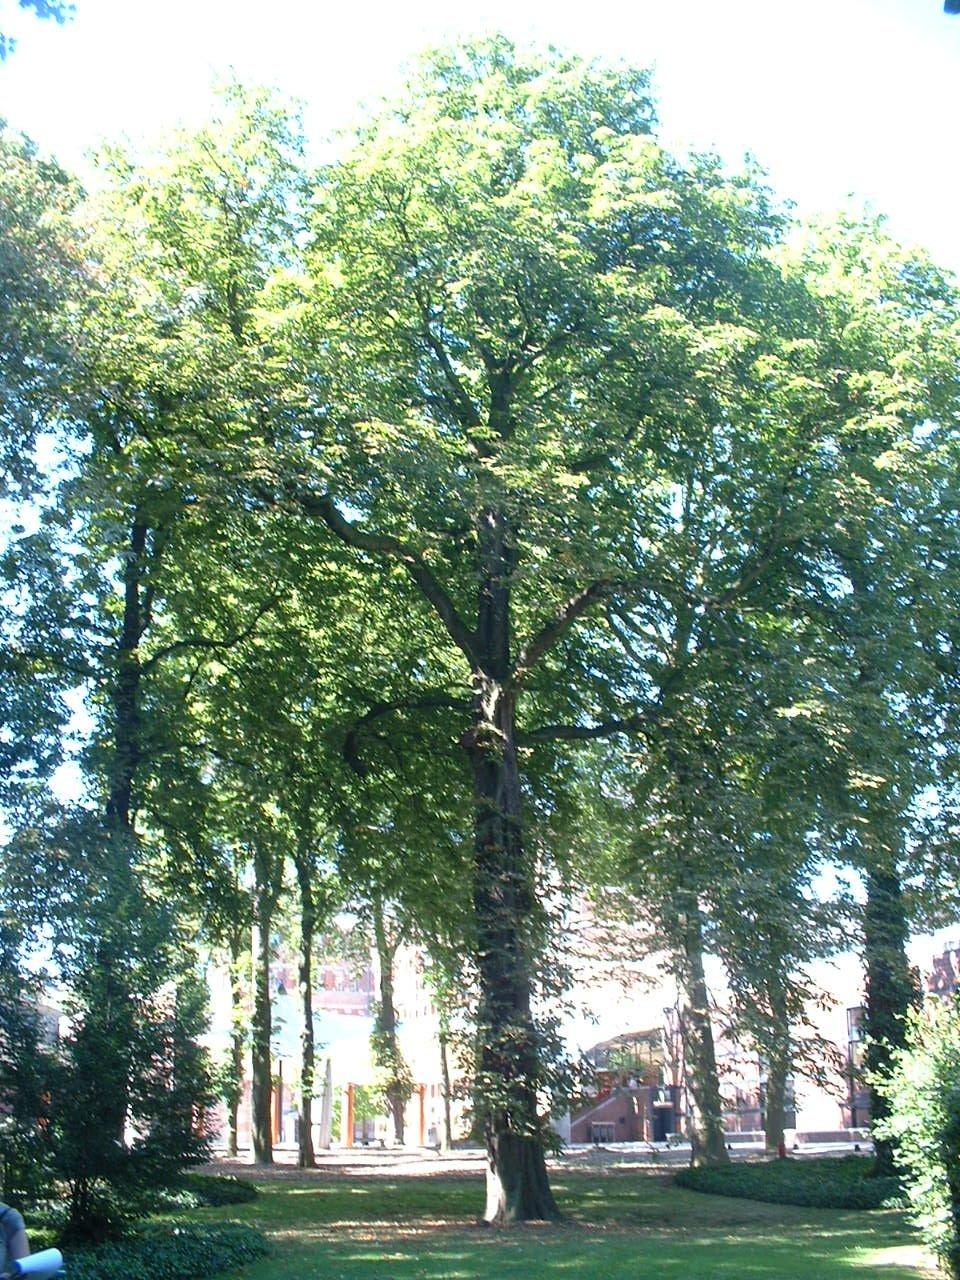 Marronnier commun – Forest, Jardin de l'école normale de Berkendael, Rue Berkendael, 70-72 –  18 Juillet 2006